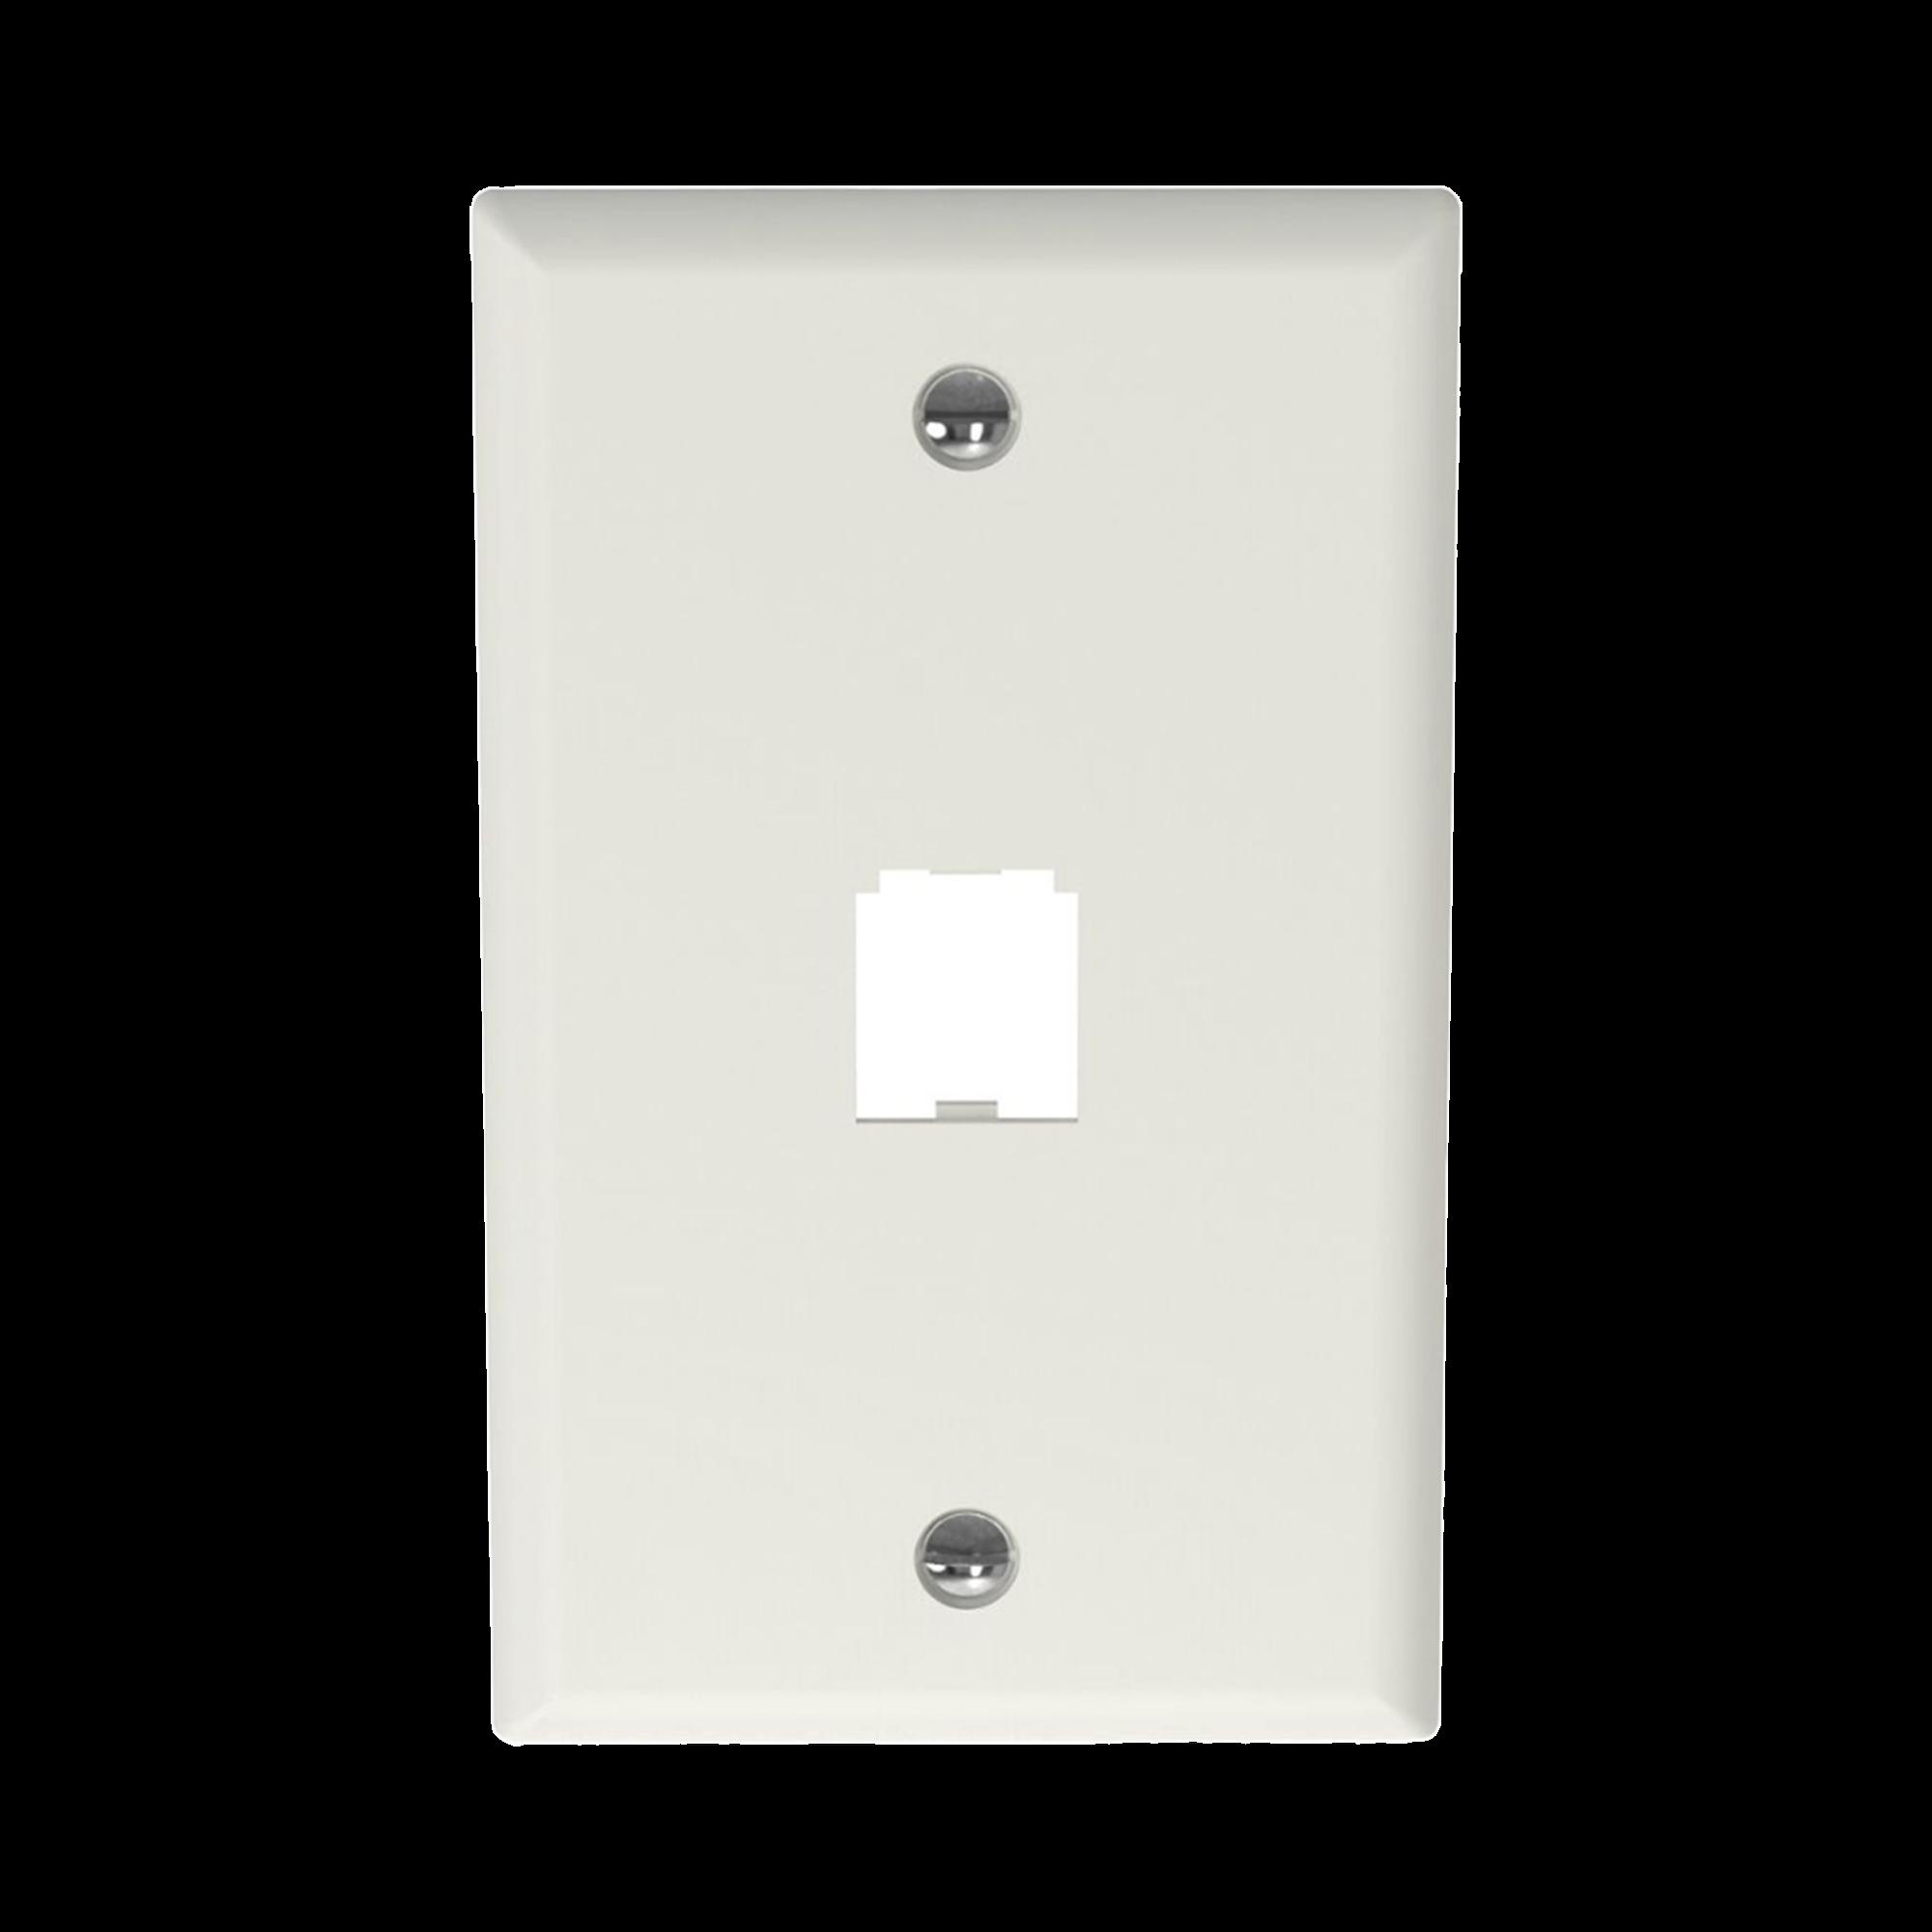 Placa de Pared Vertical Clasica, Salida Para 1 Puerto Mini-Com, Color Blanco Mate